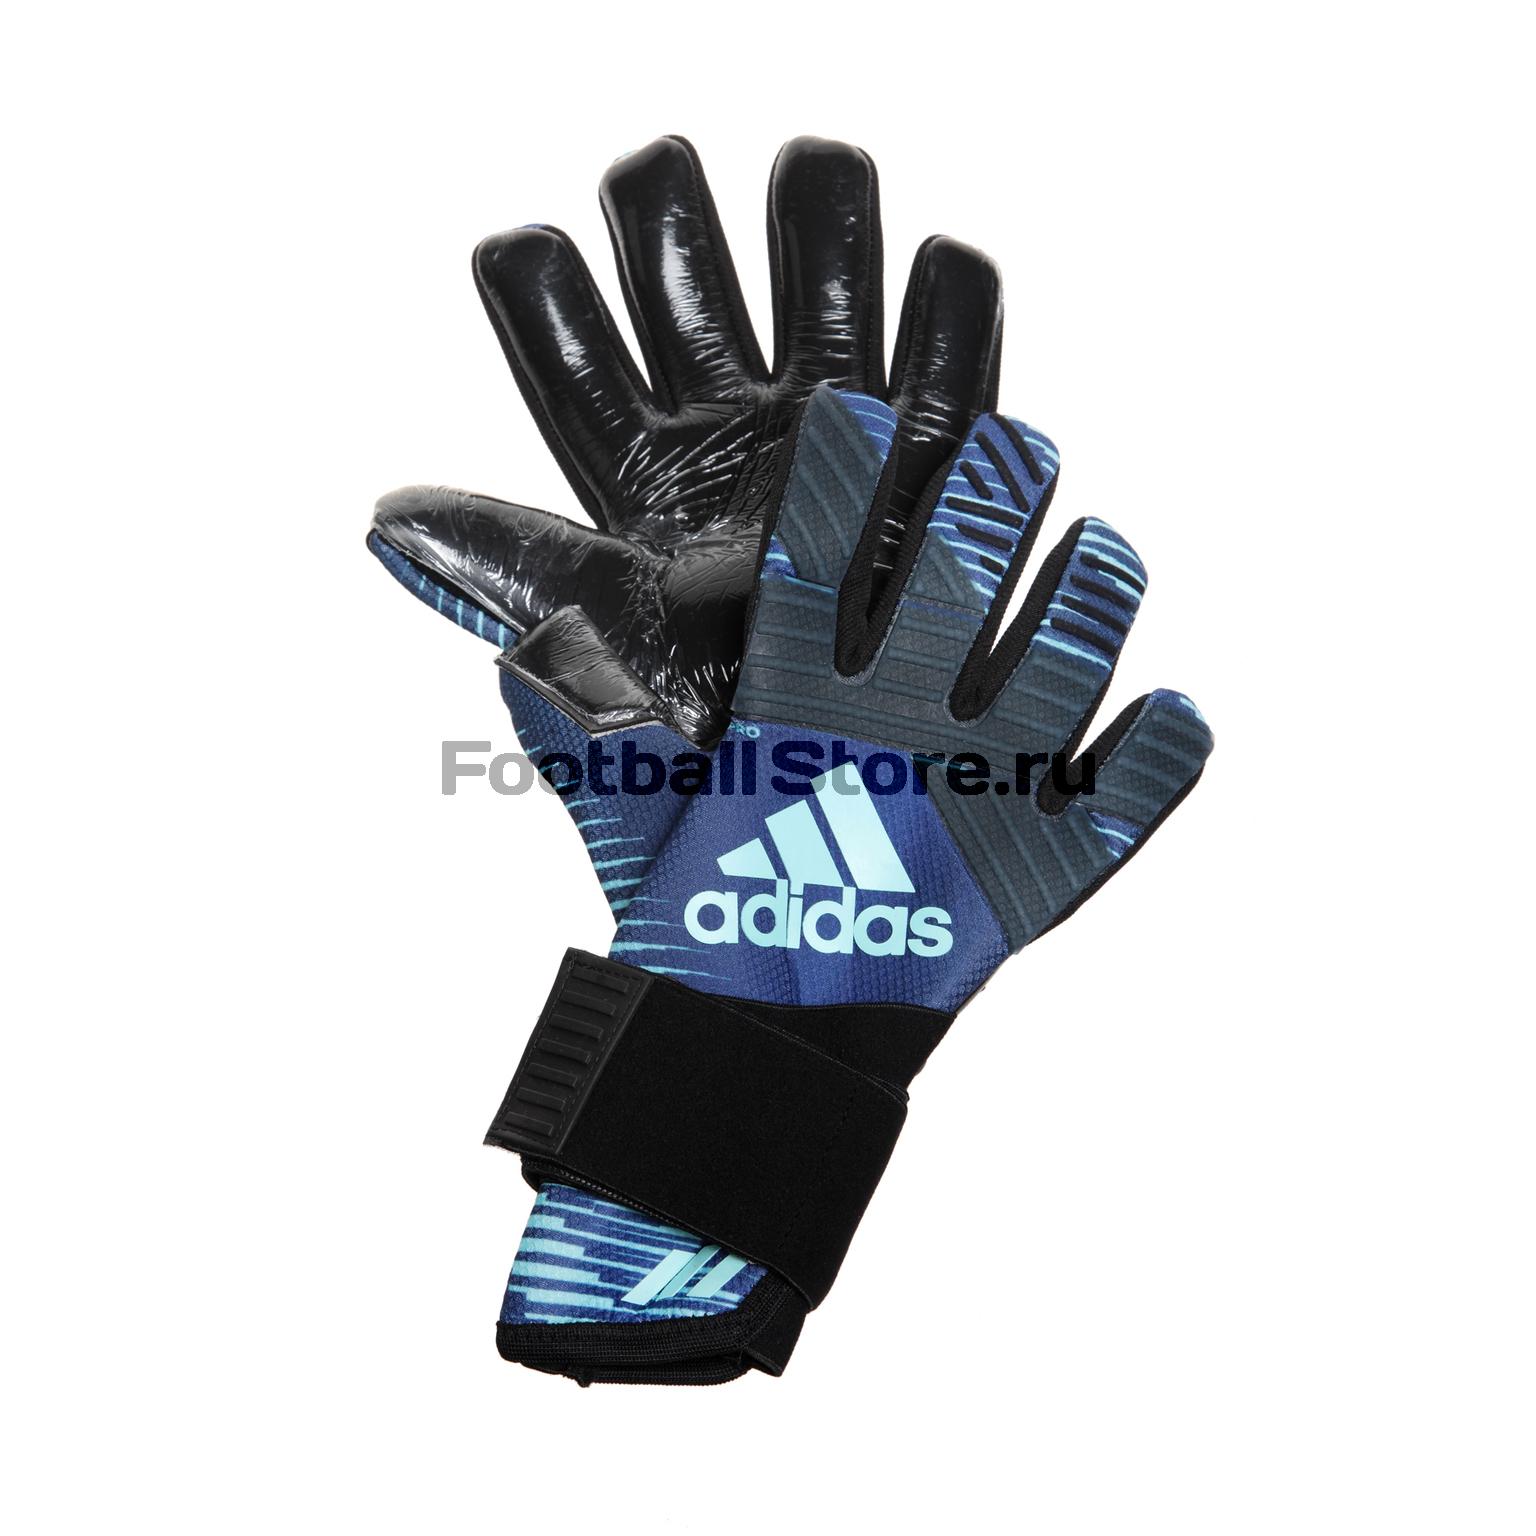 Перчатки вратарские Adidas Ace Thunderstor CD9129 перчатки вратарские adidas ace half neg az3688